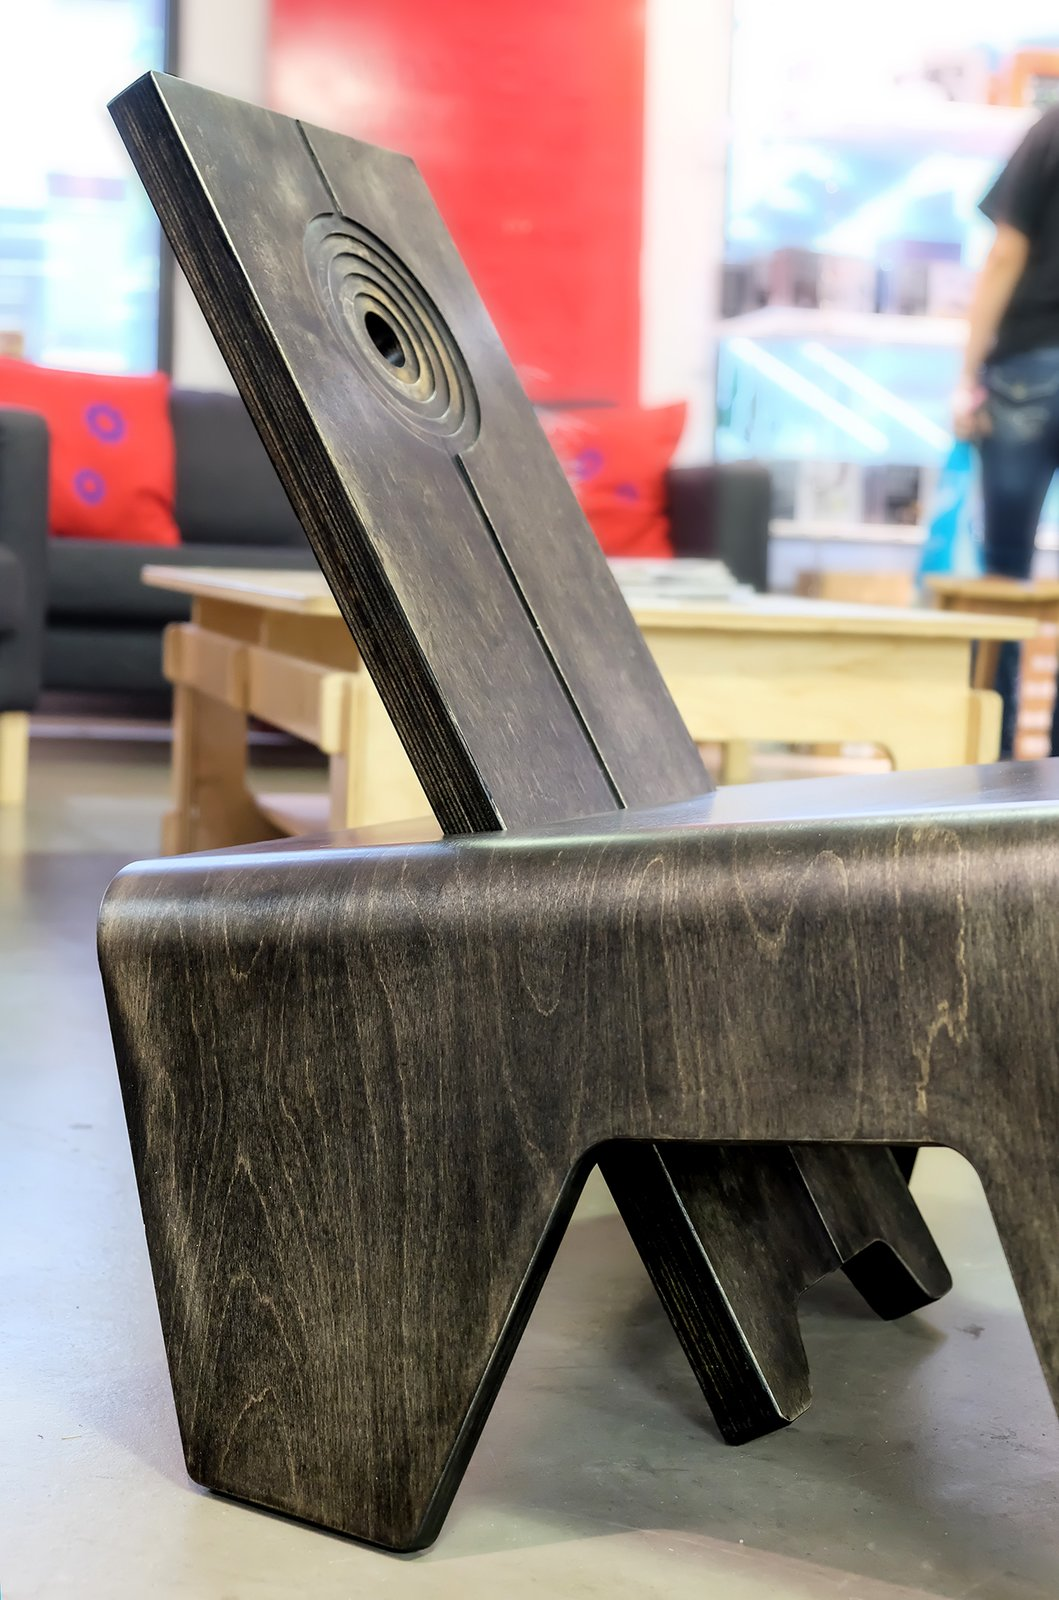 Photo 3 of 5 in African Designs Go Mainstream: Jomo Tariku Showcases The Birth Chair II at Dubai Design Week